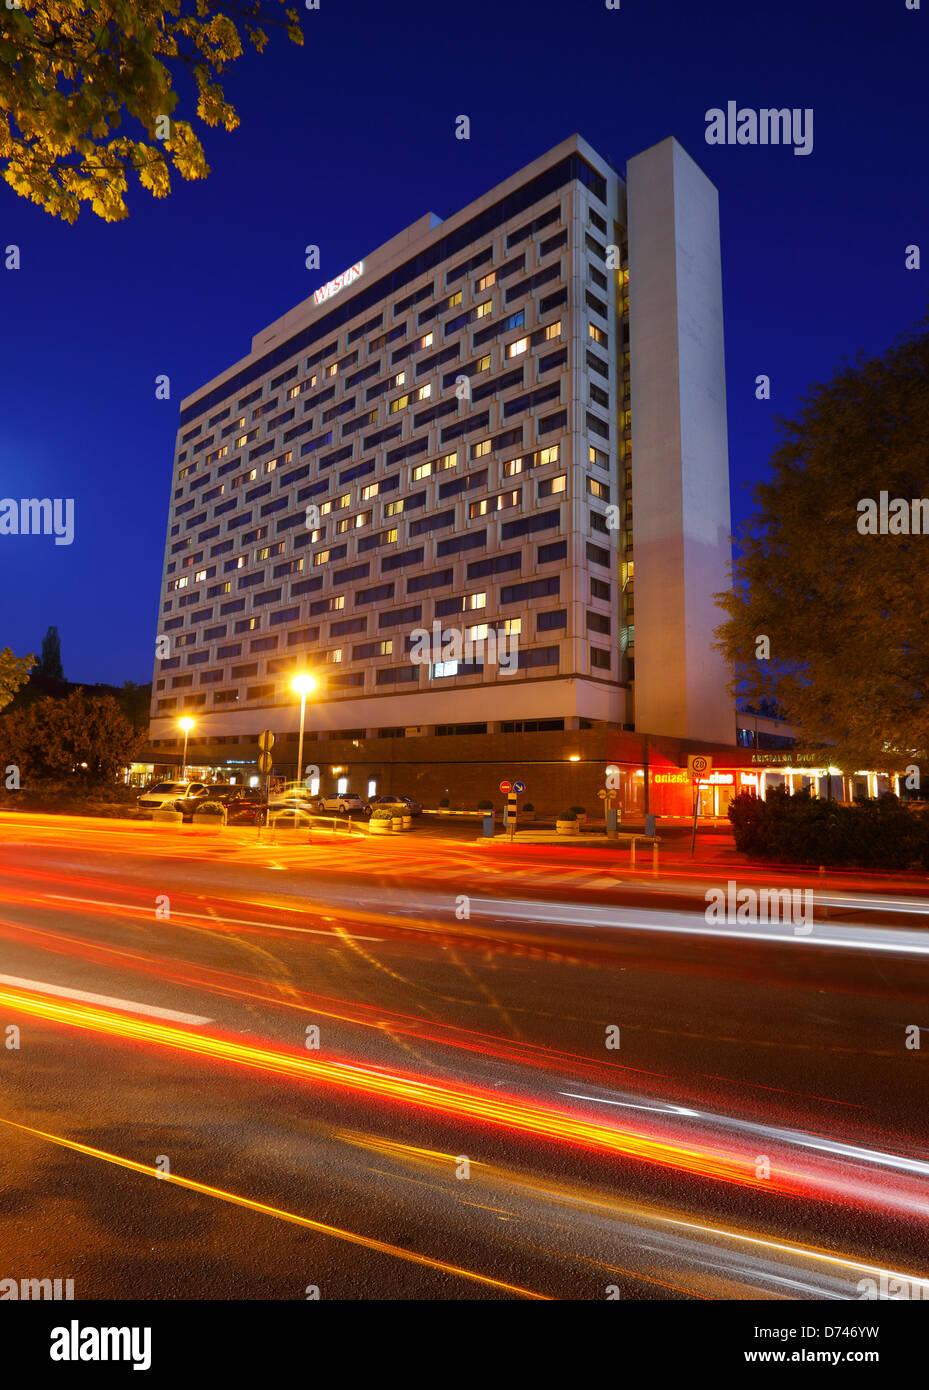 Hôtel The Westin Zagreb, dans la nuit, Croatie Photo Stock